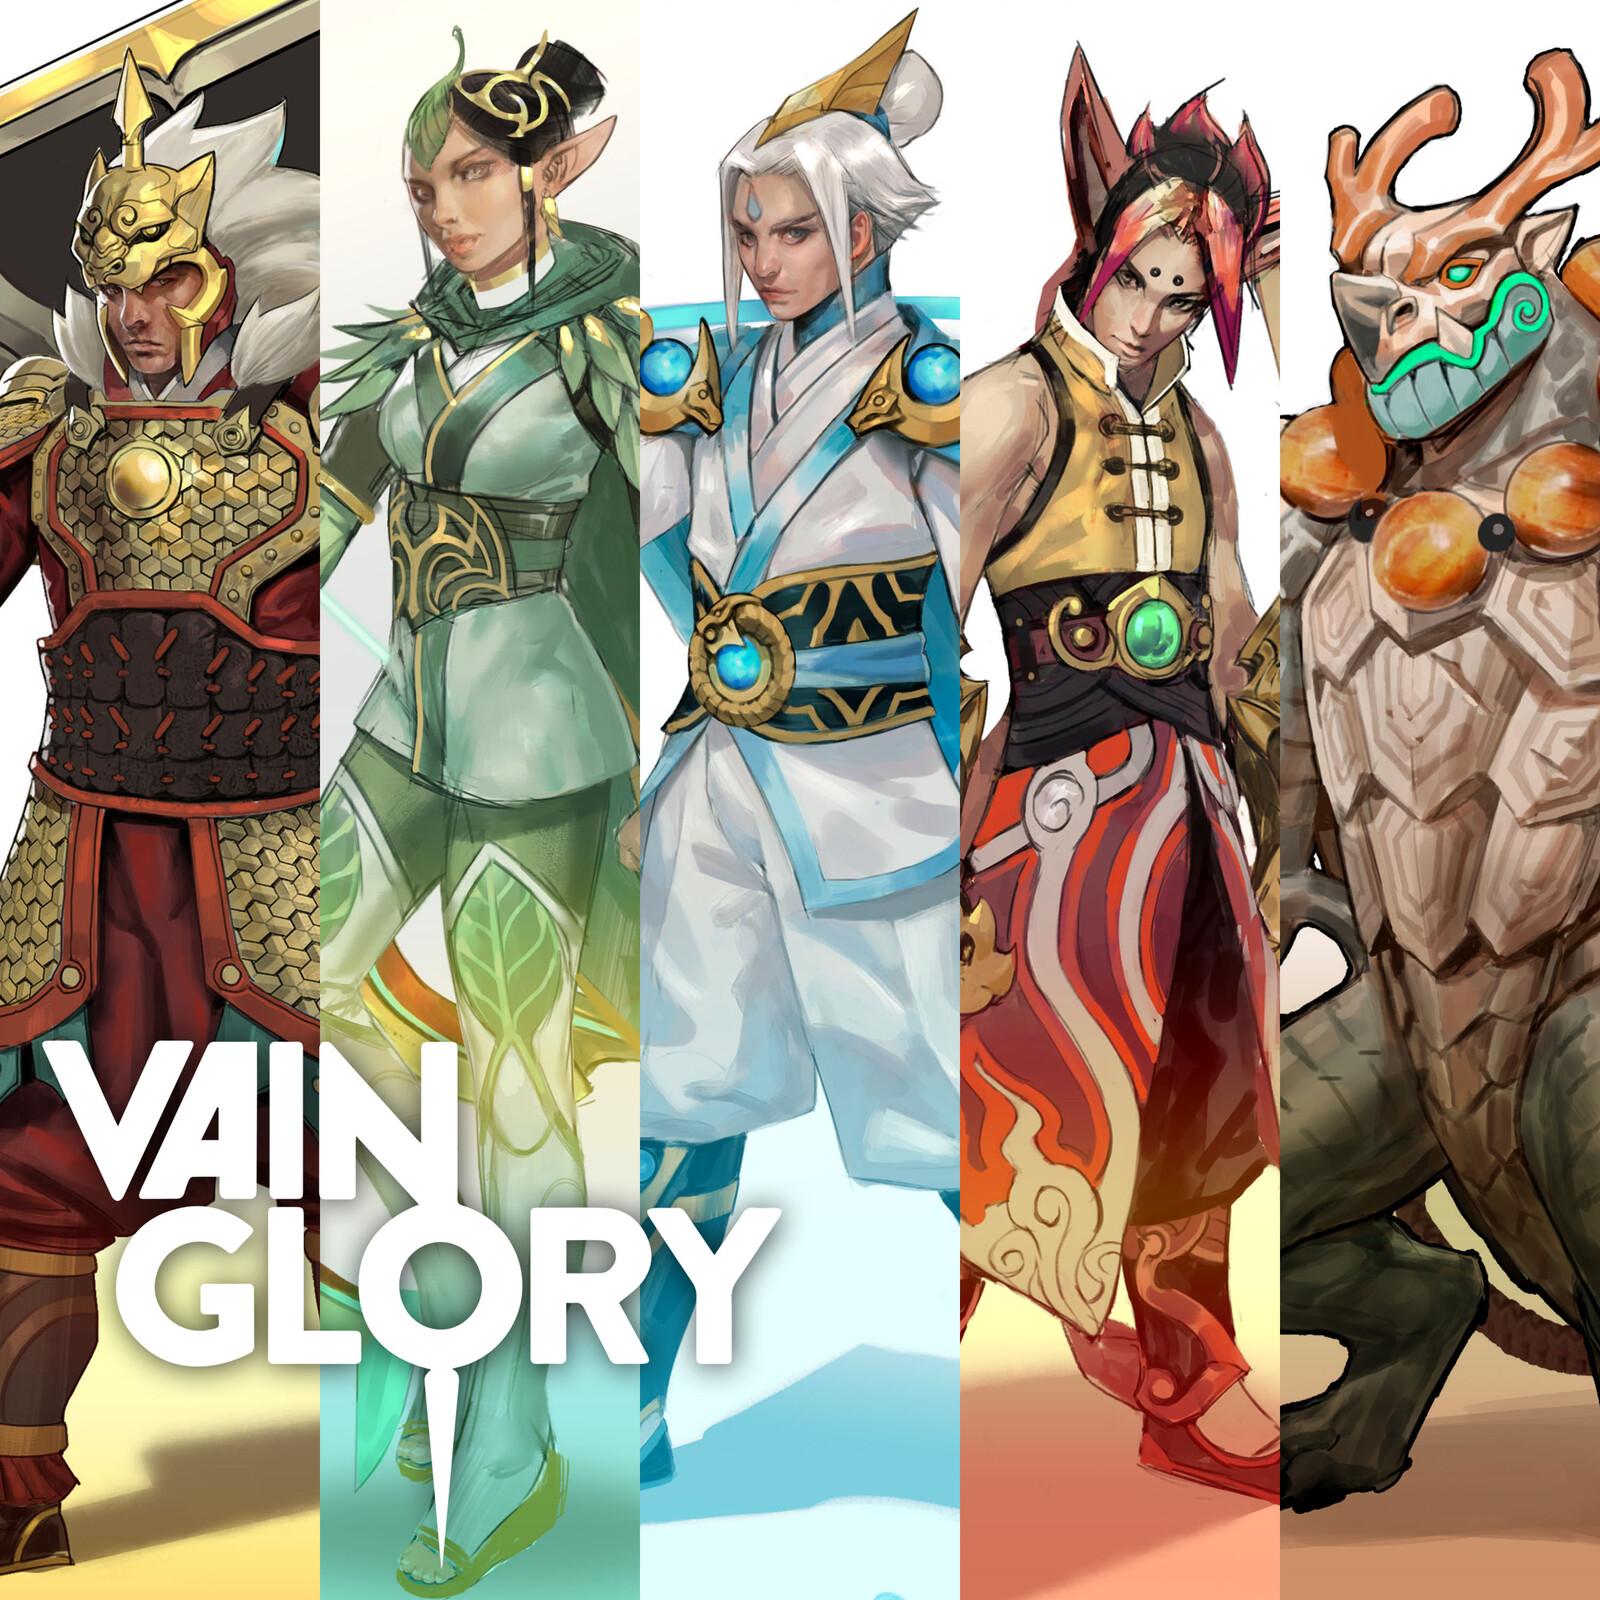 Wu Xing Skins - Vainglory